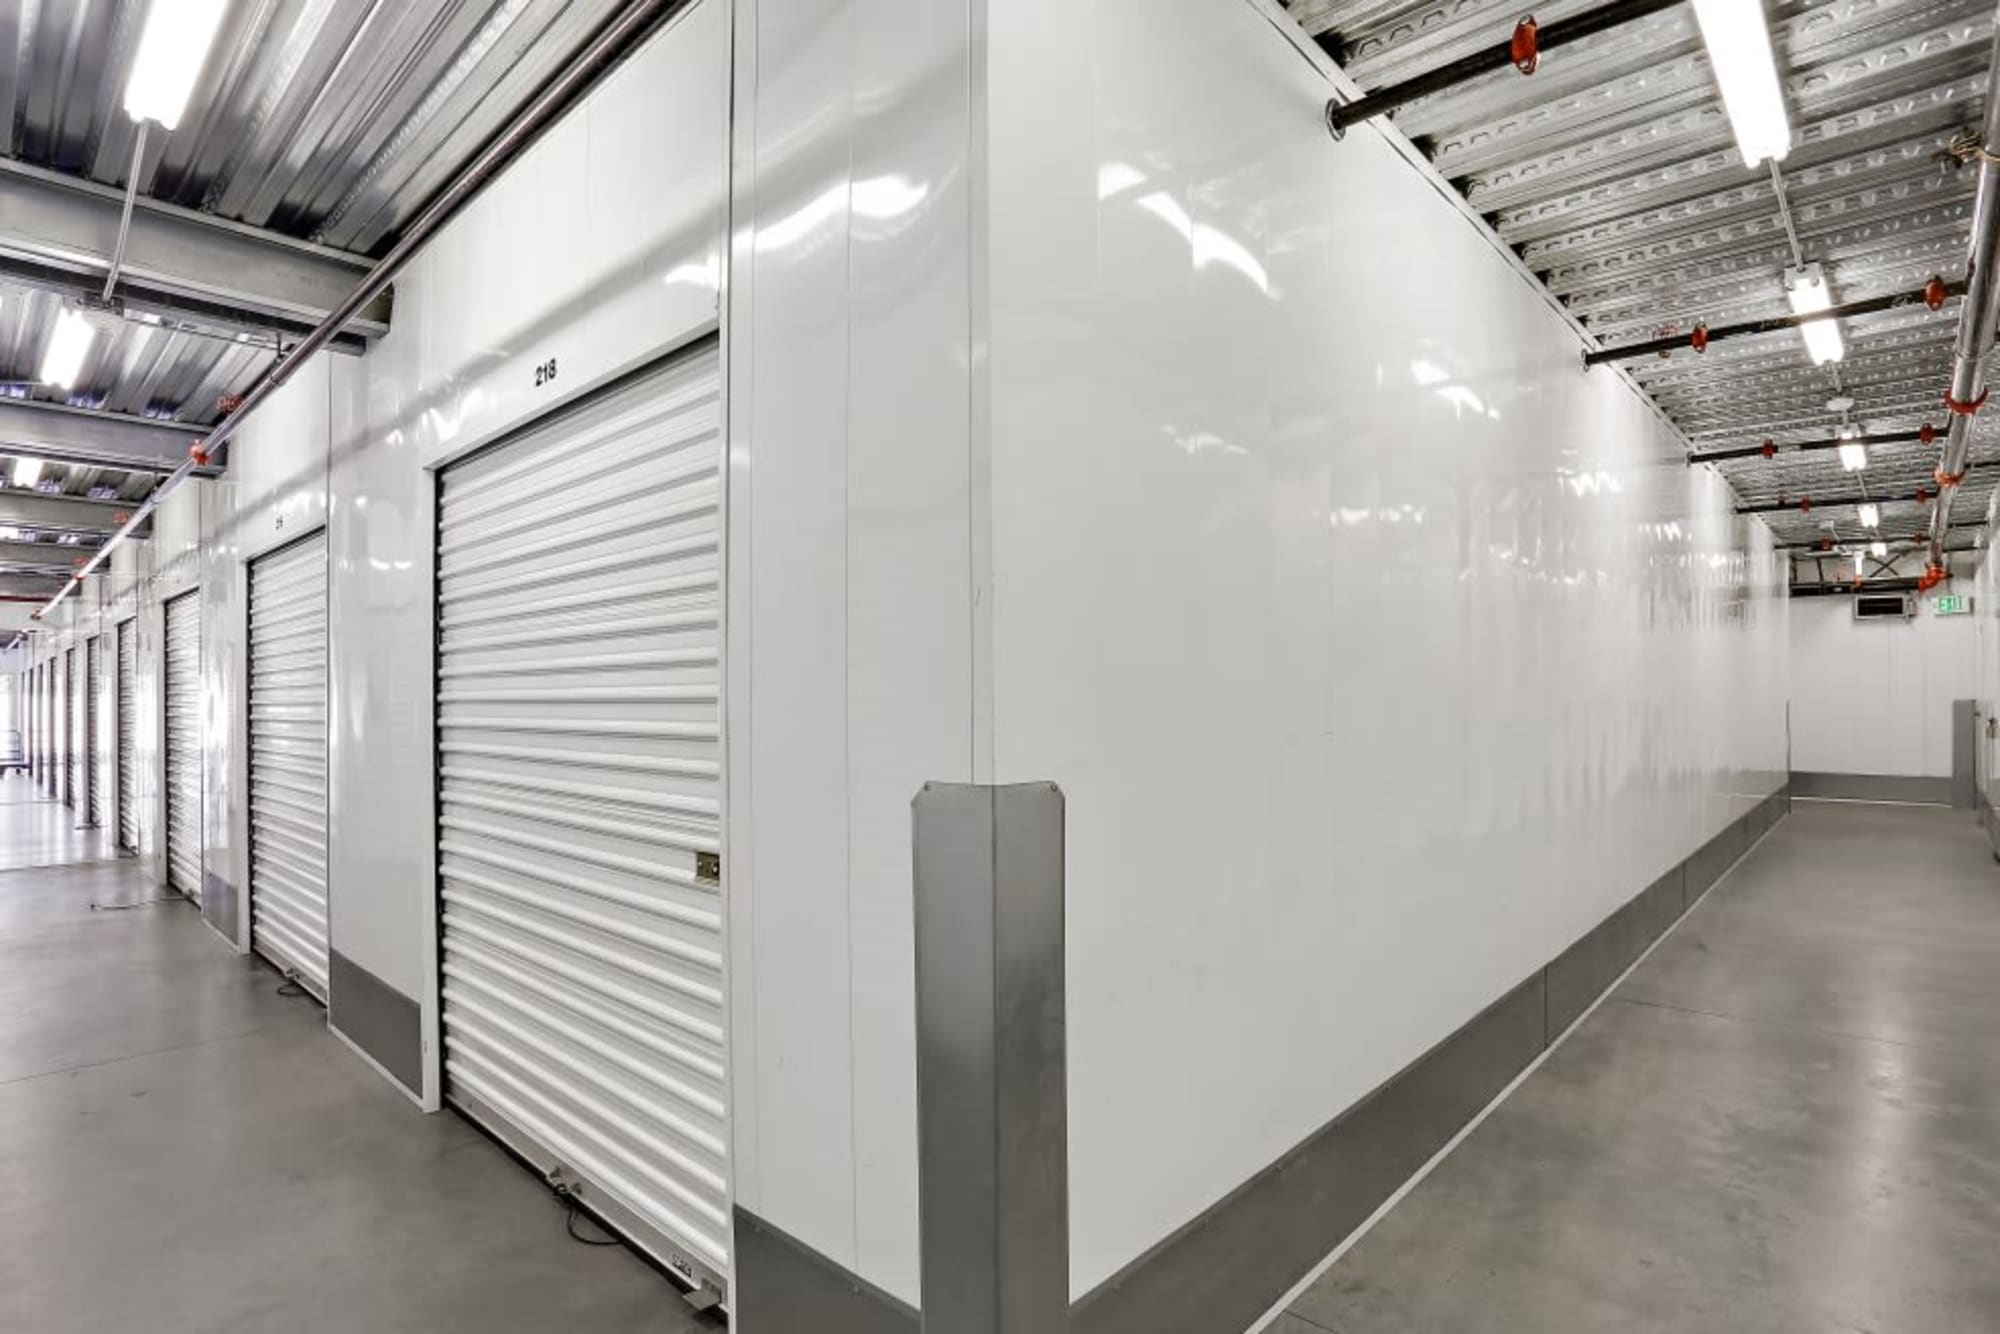 Clean hallways in A-1 Self Storage in San Diego, California